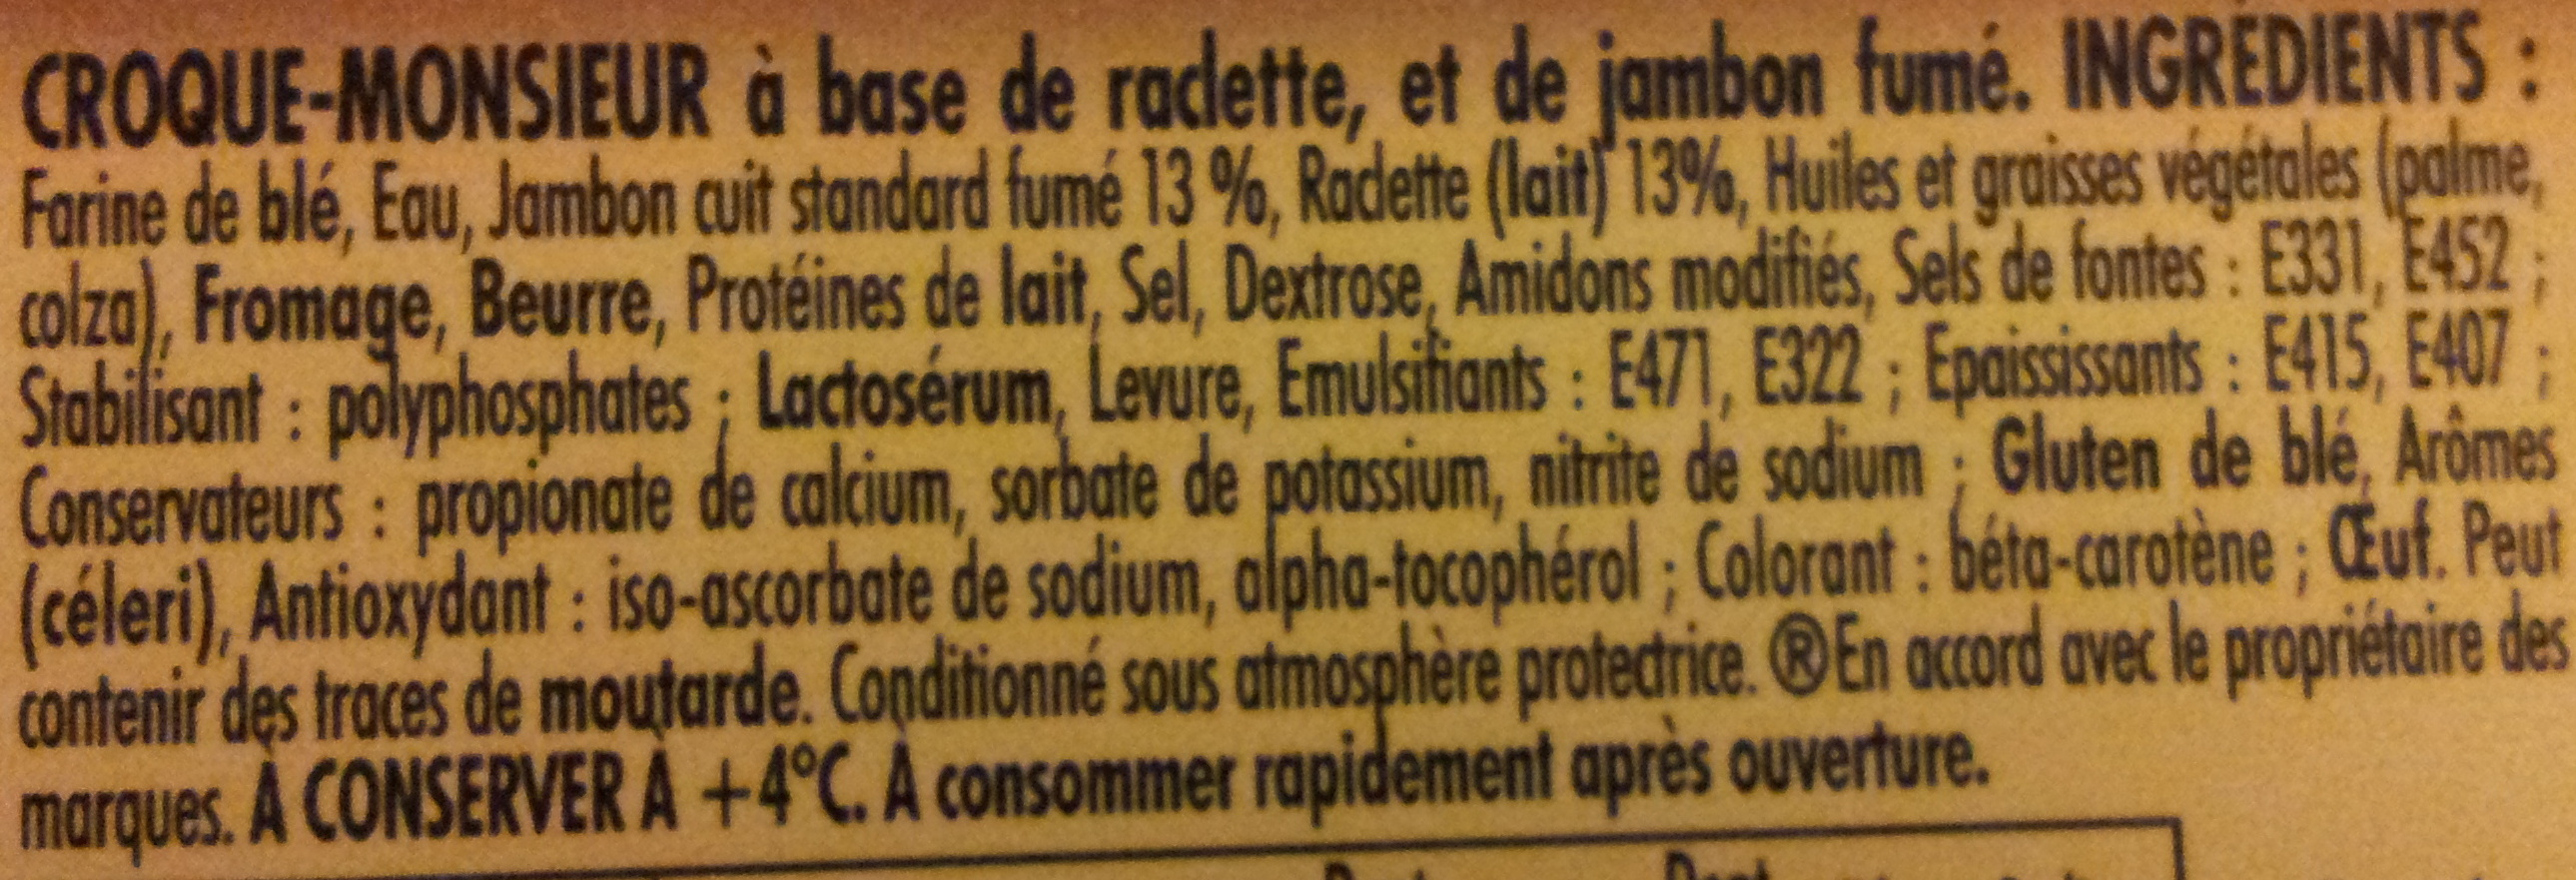 Tendre Croque, Montagnard (Fromage à raclette & Jambon fumé) - Ingrediënten - fr